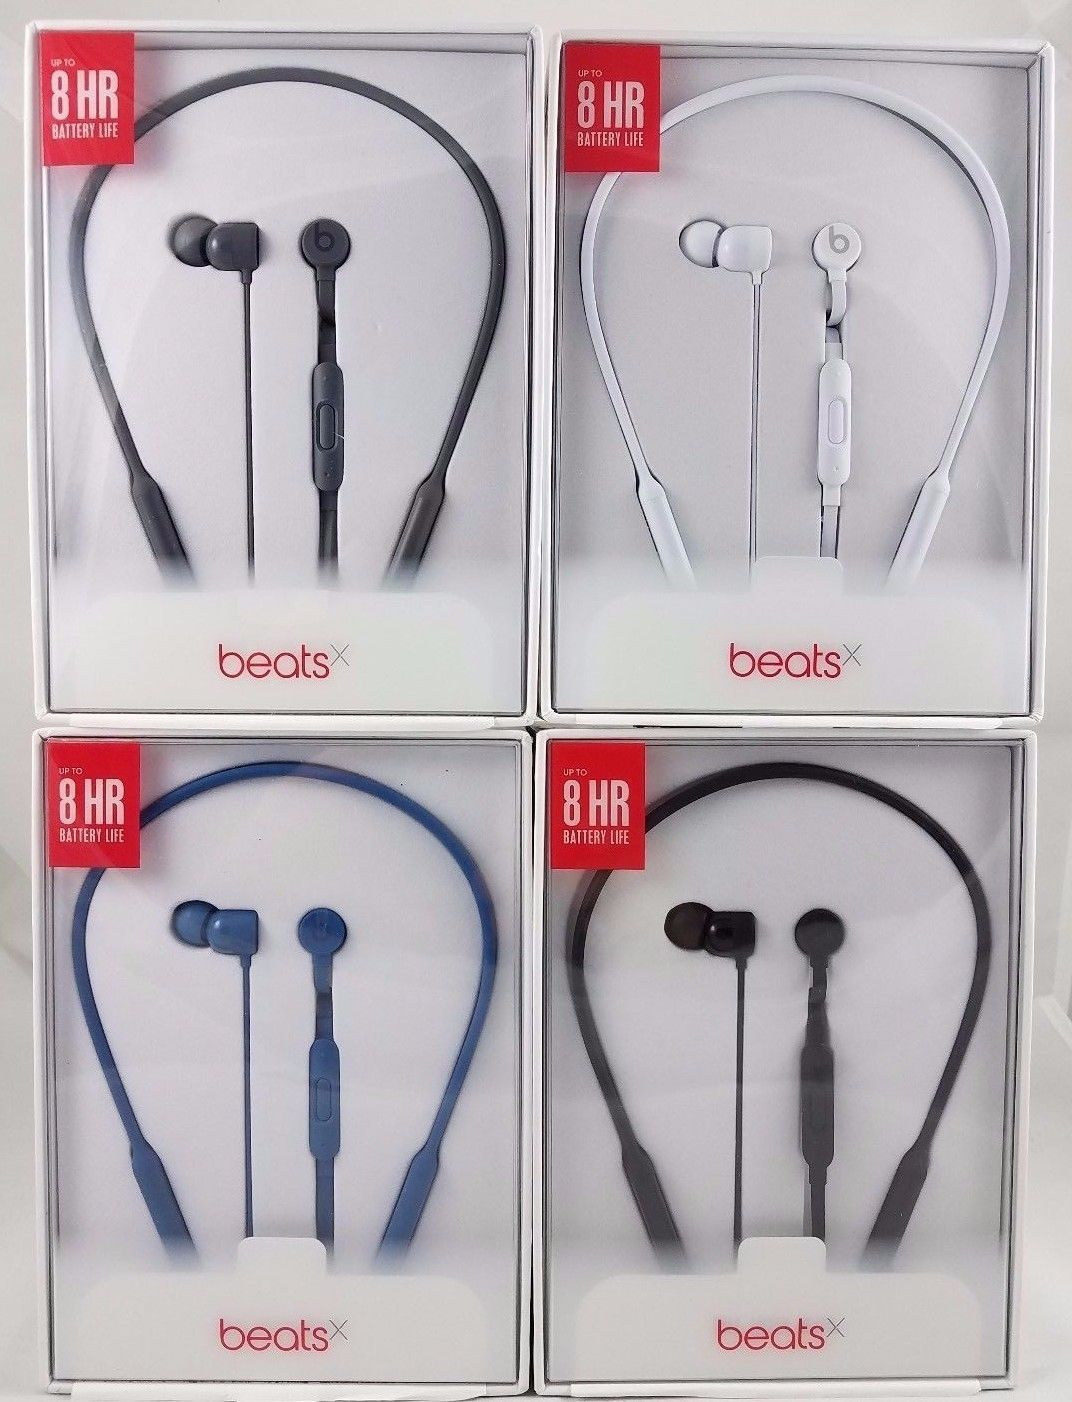 bbdedabca67 Headphones Headset New Beats by Dr. Dre BeatsX Beats X Wireless Bluetooth  In-Ear Headphones NEW OPEN RETAIL BOX